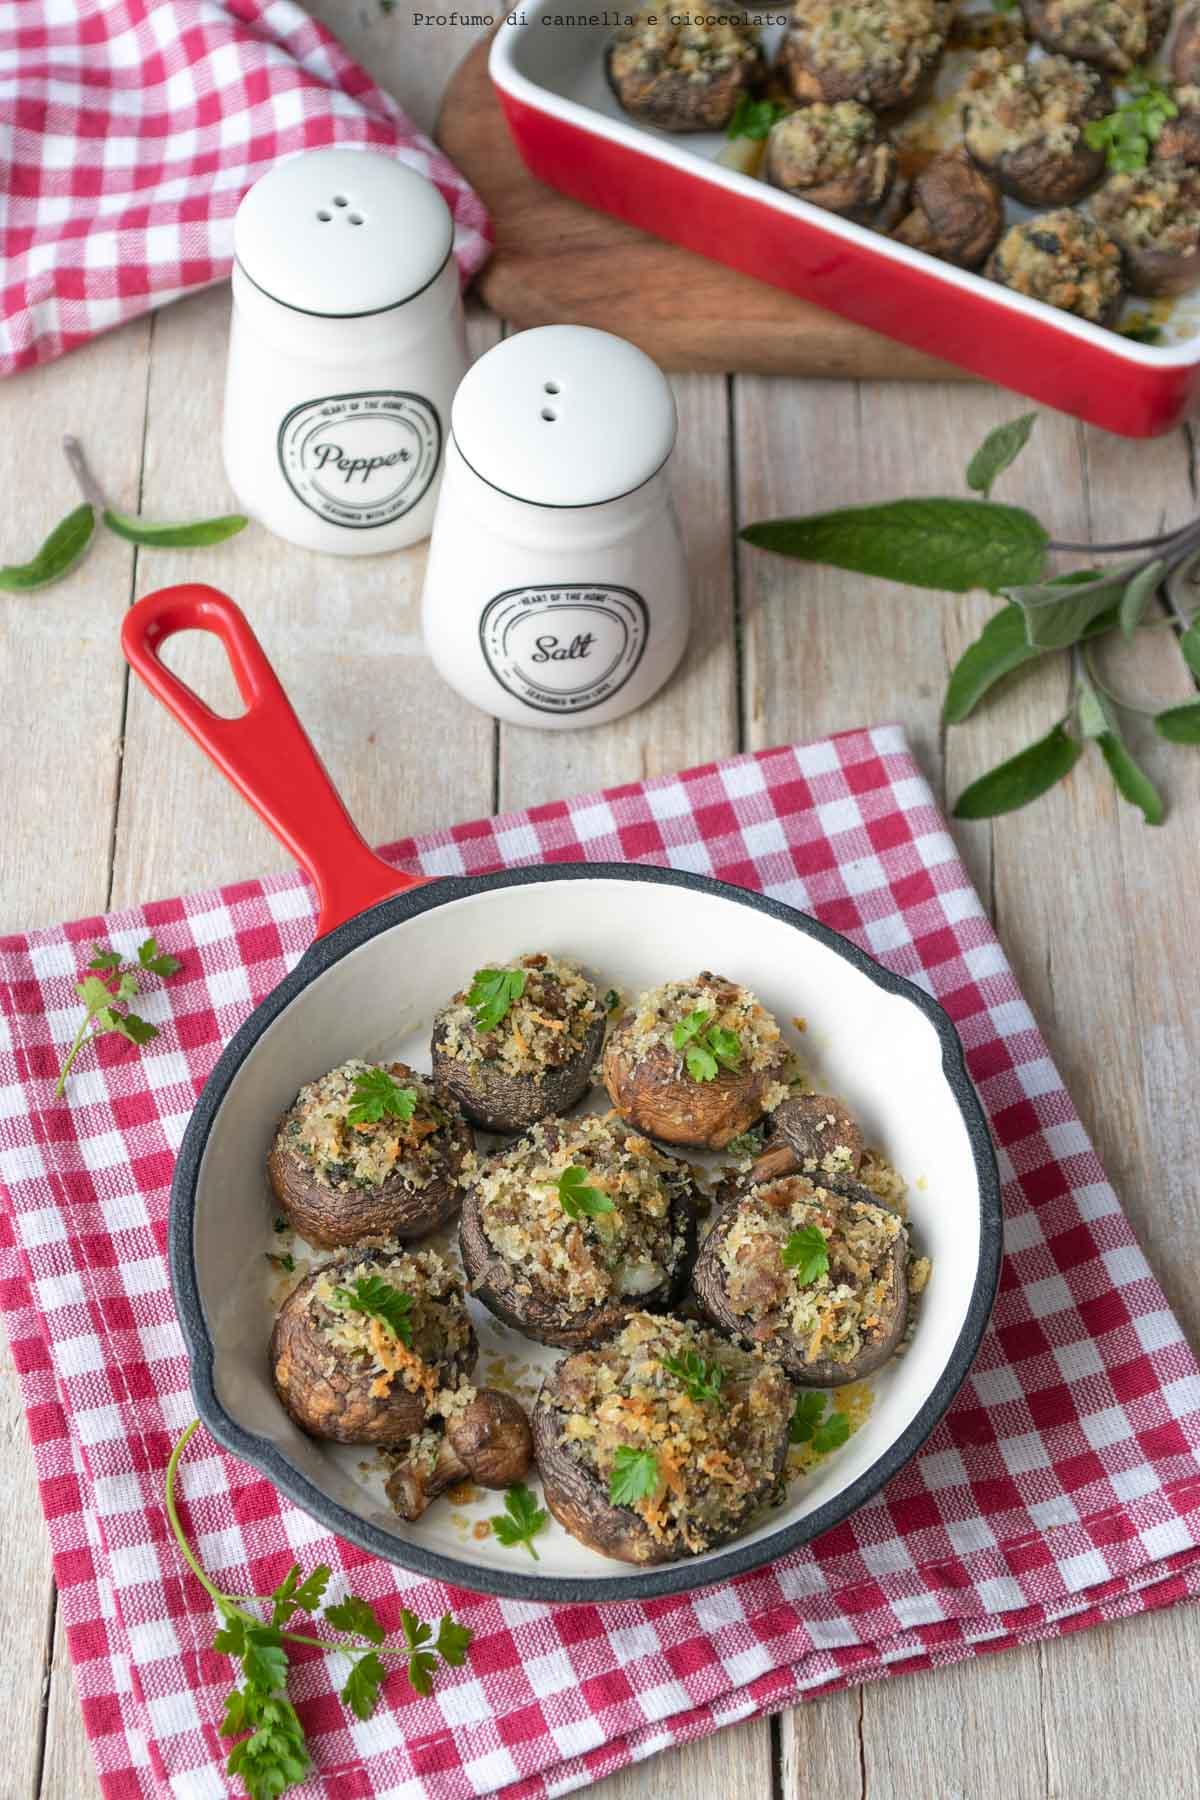 Funghi ripieni vegetariani